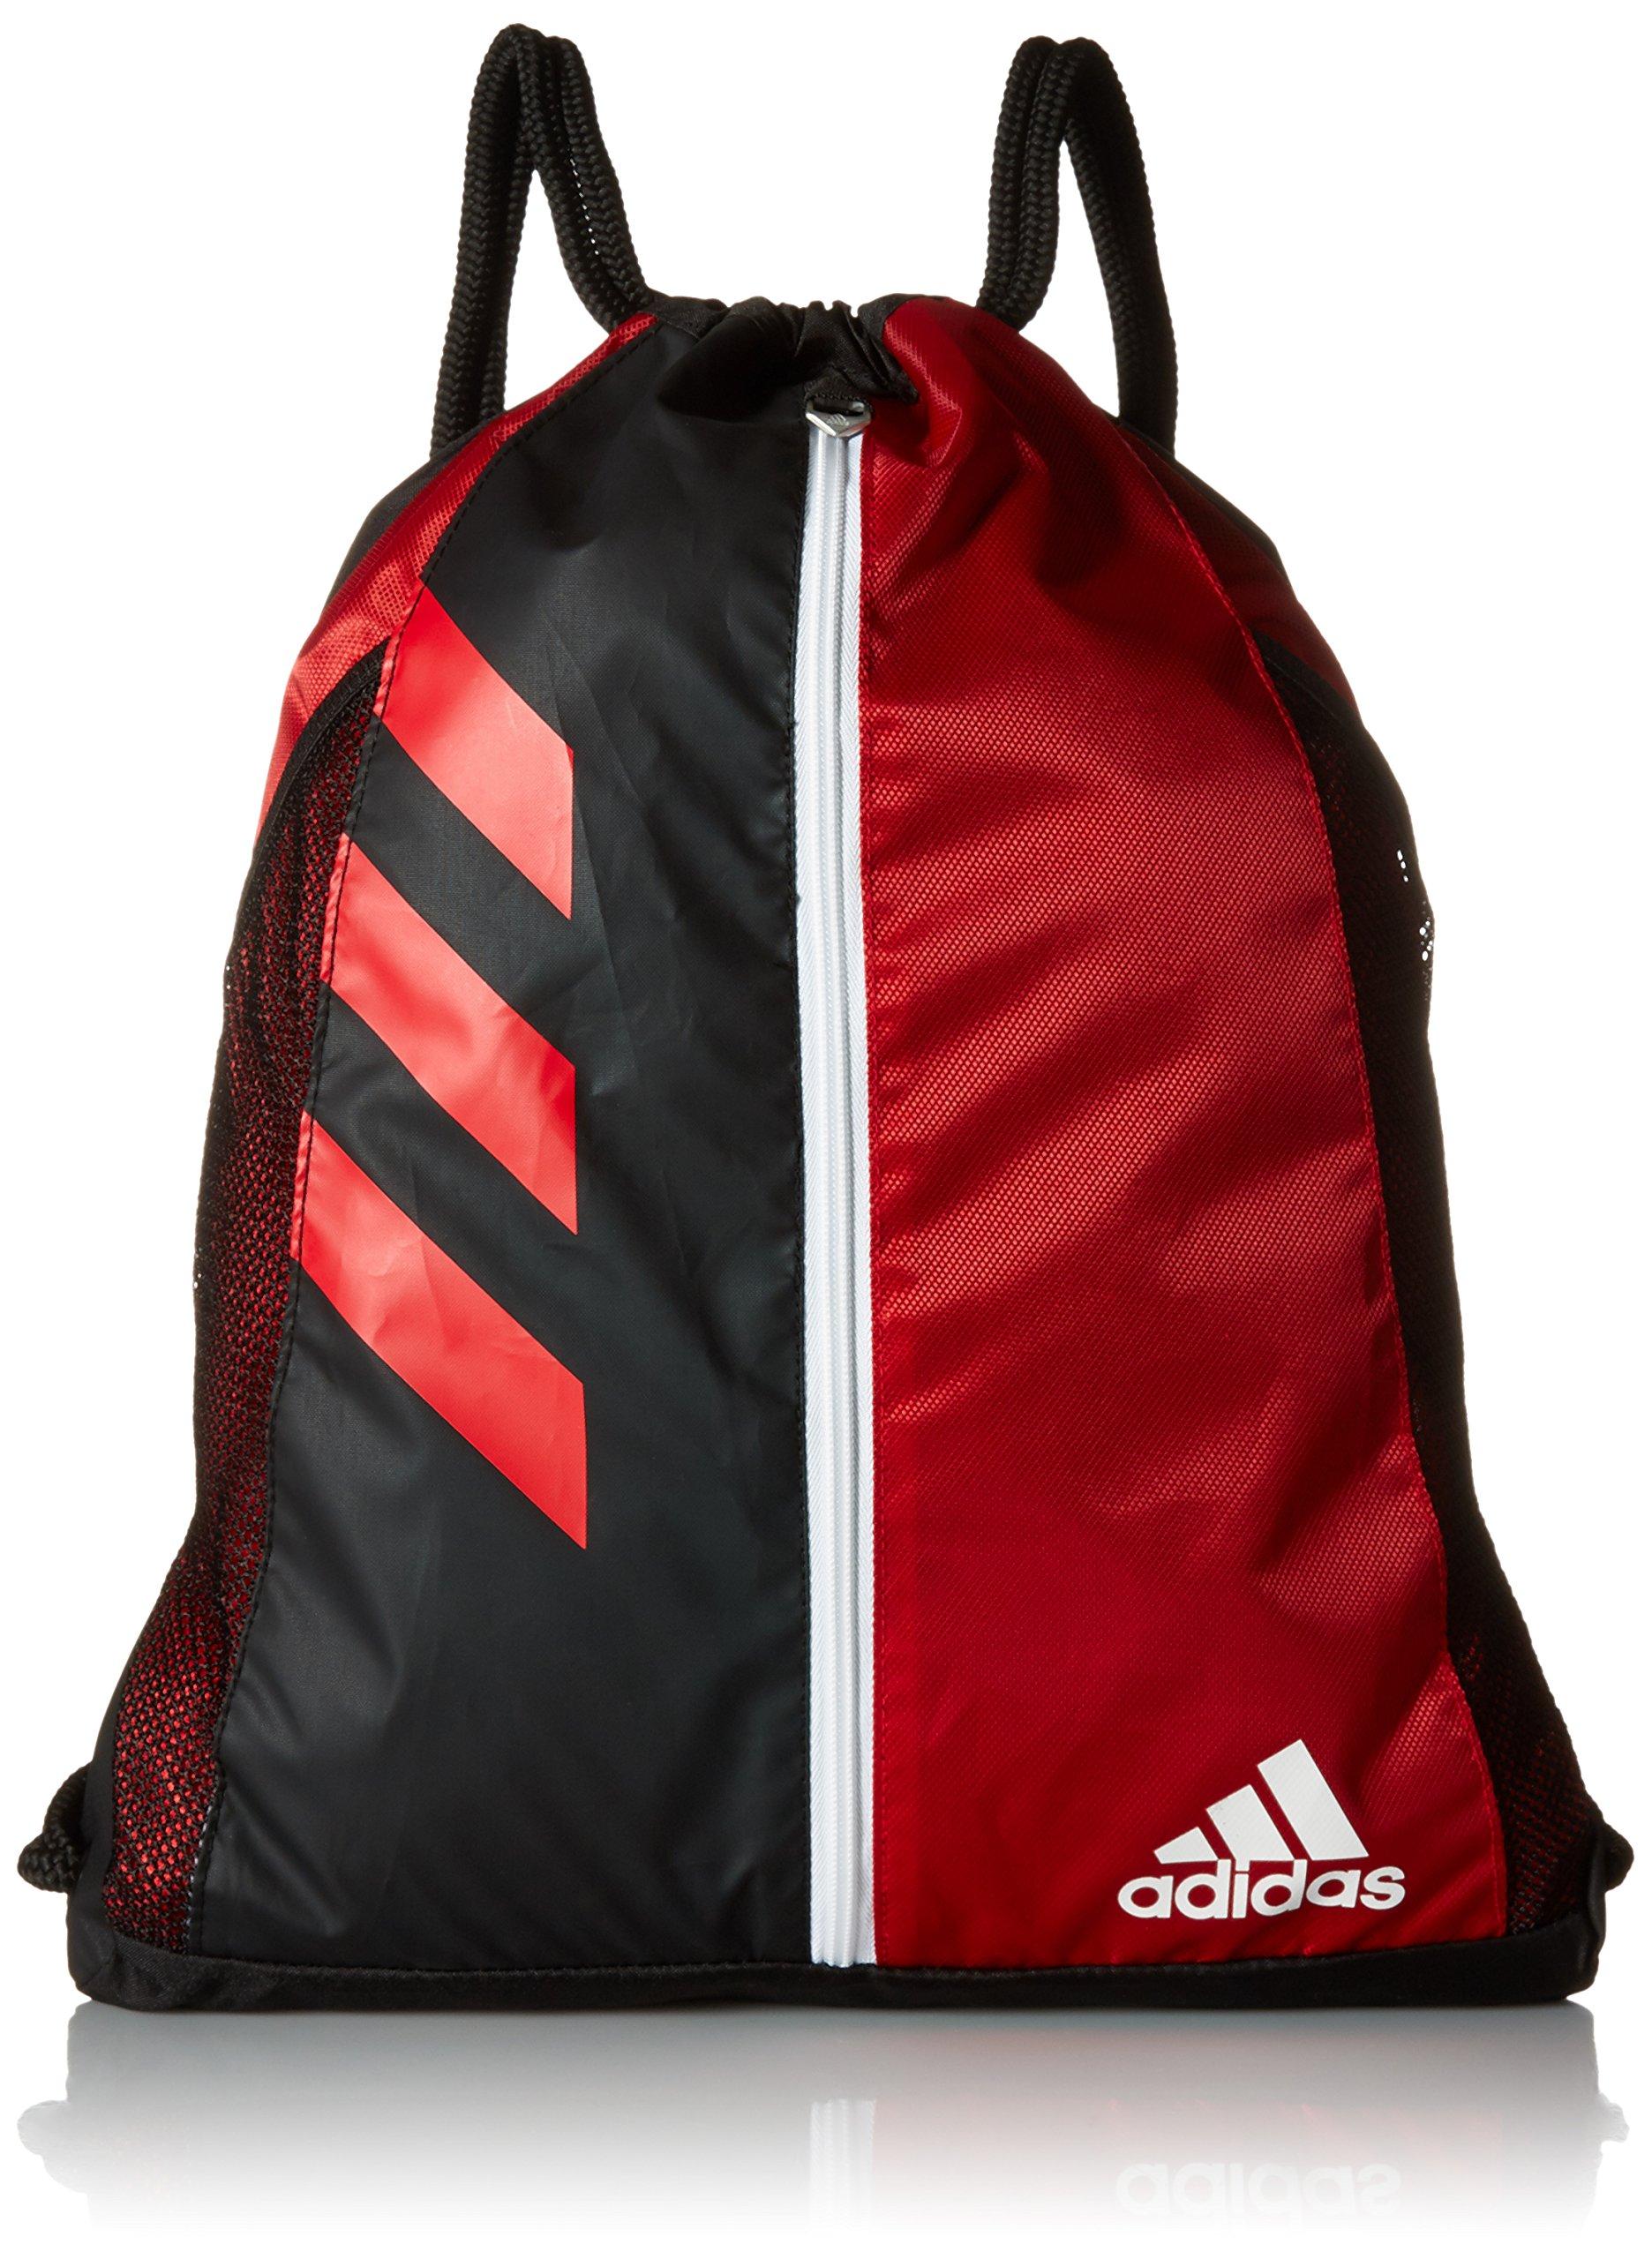 0e9bc9adee Amazon.com  adidas Team Issue Sackpack